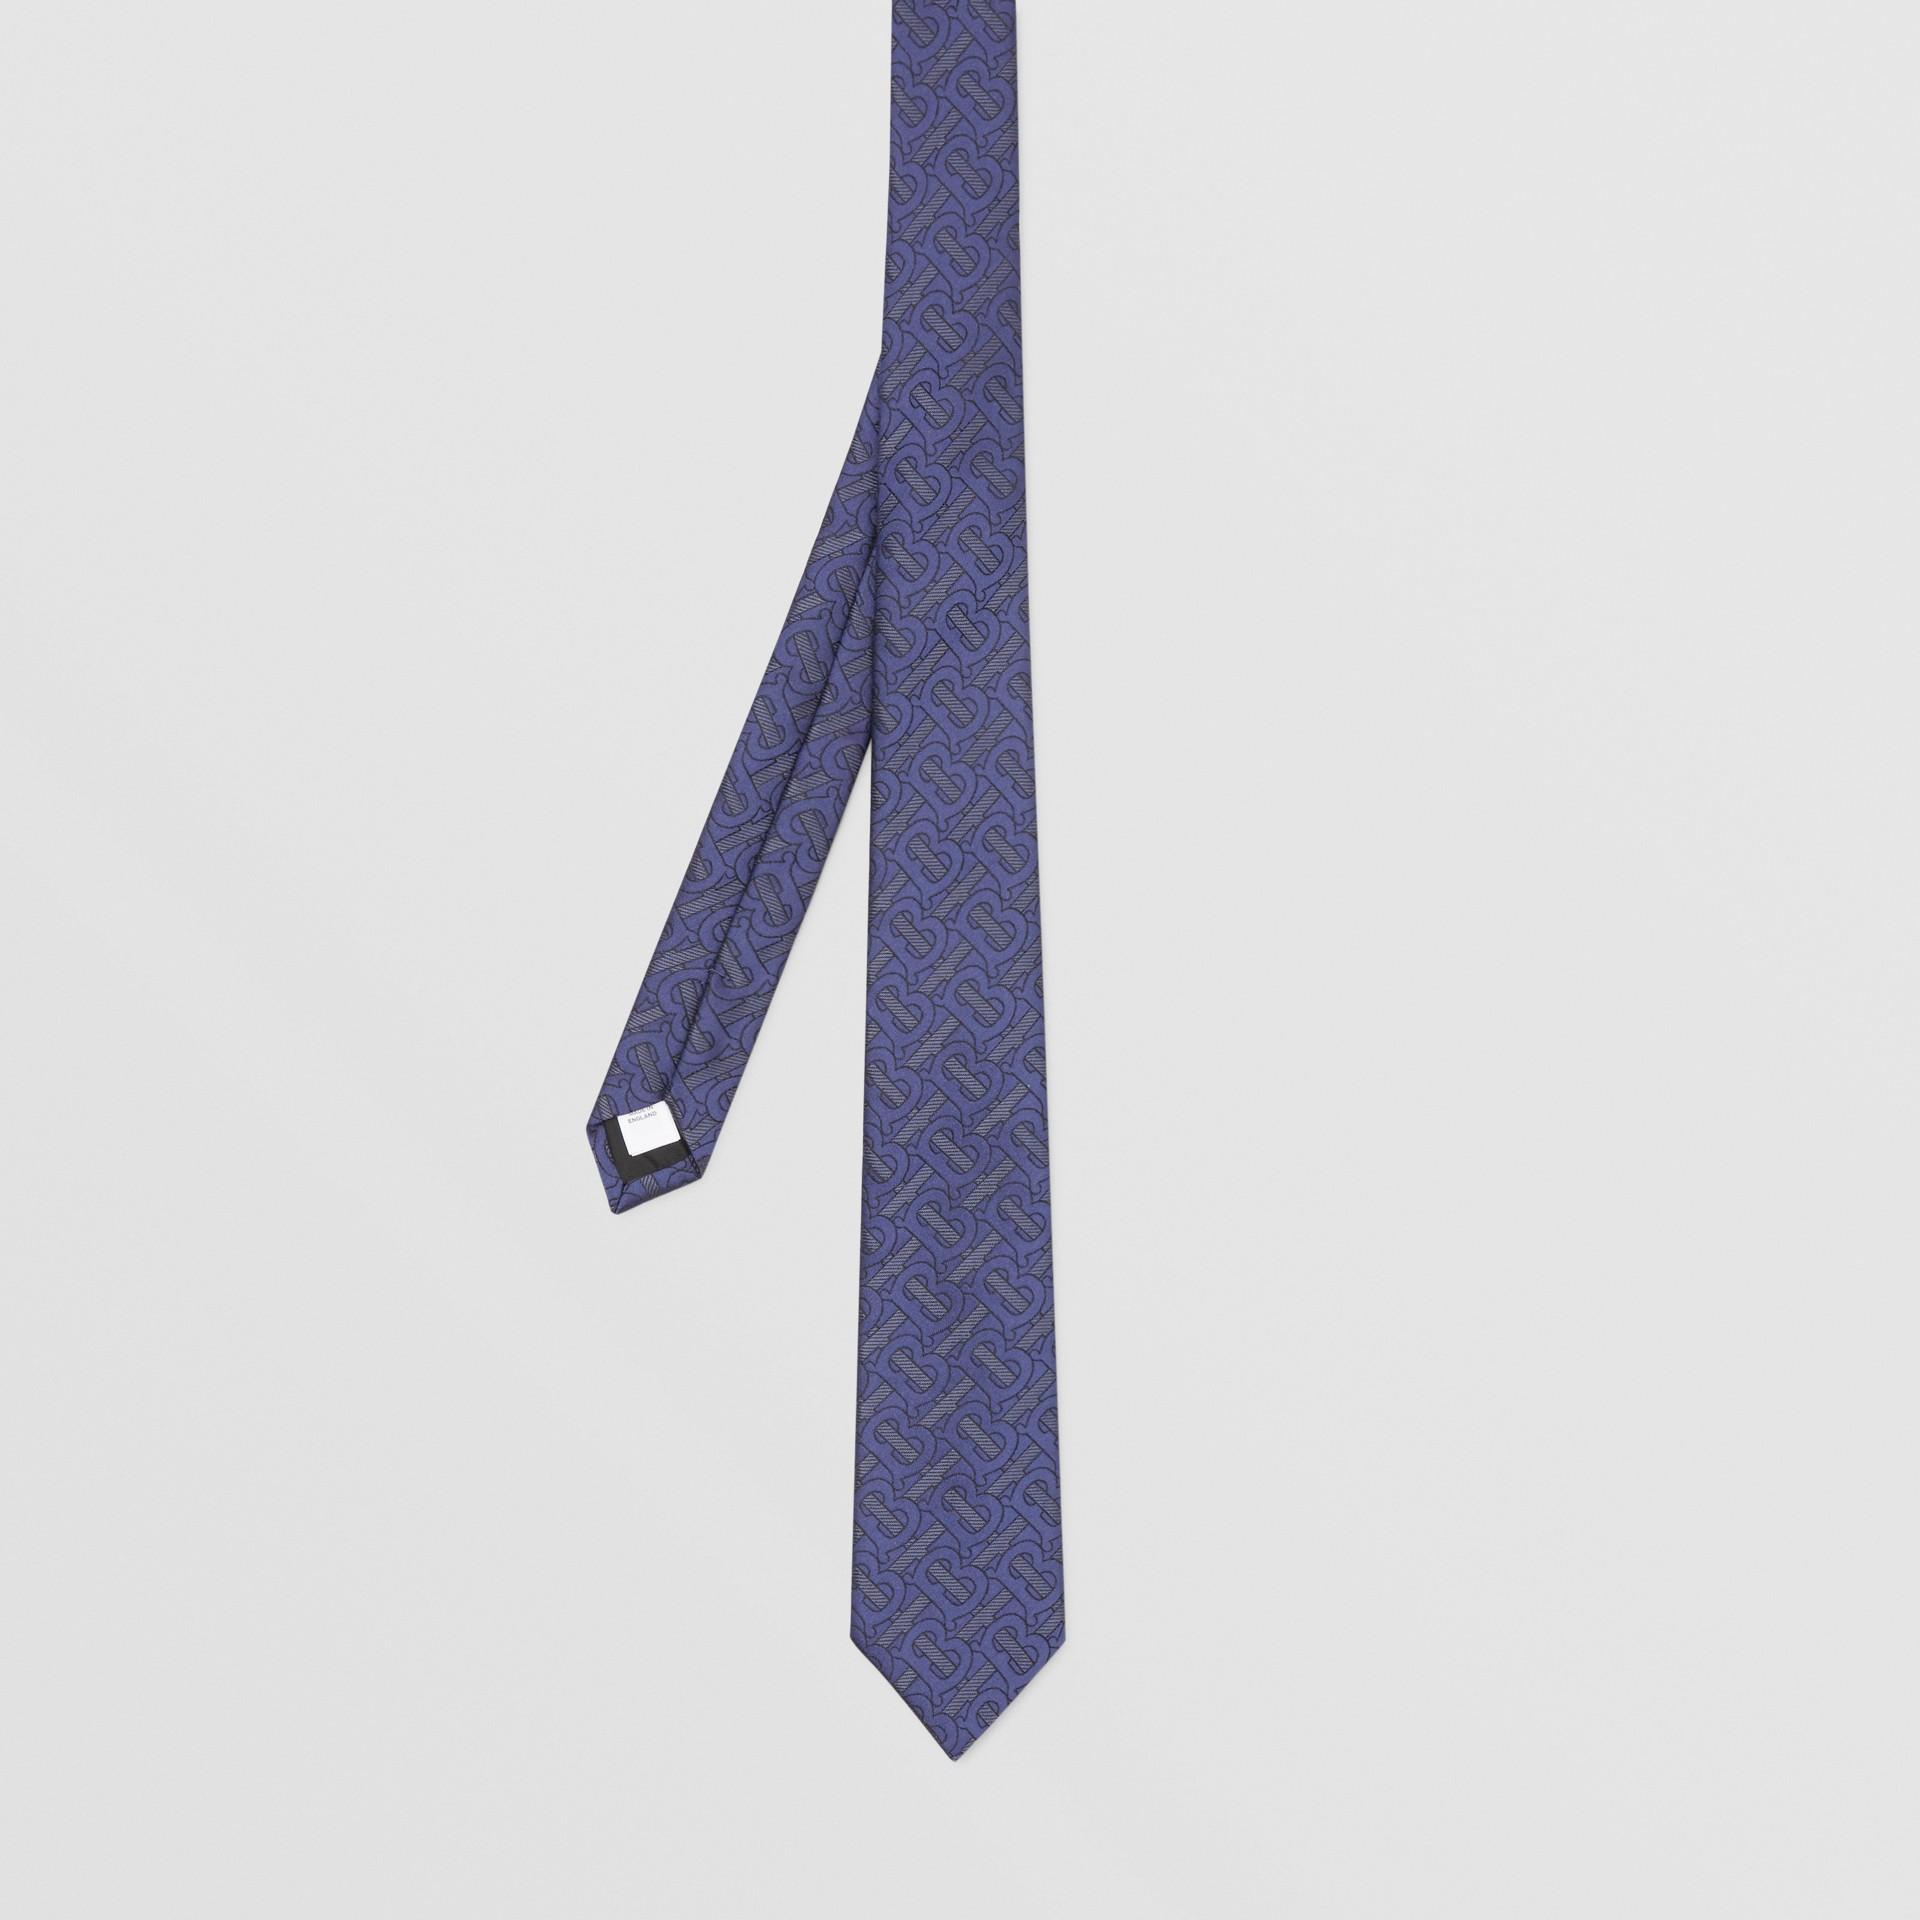 Classic Cut Monogram Silk Blend Jacquard Tie in Bright Indigo - Men | Burberry Hong Kong S.A.R - gallery image 4